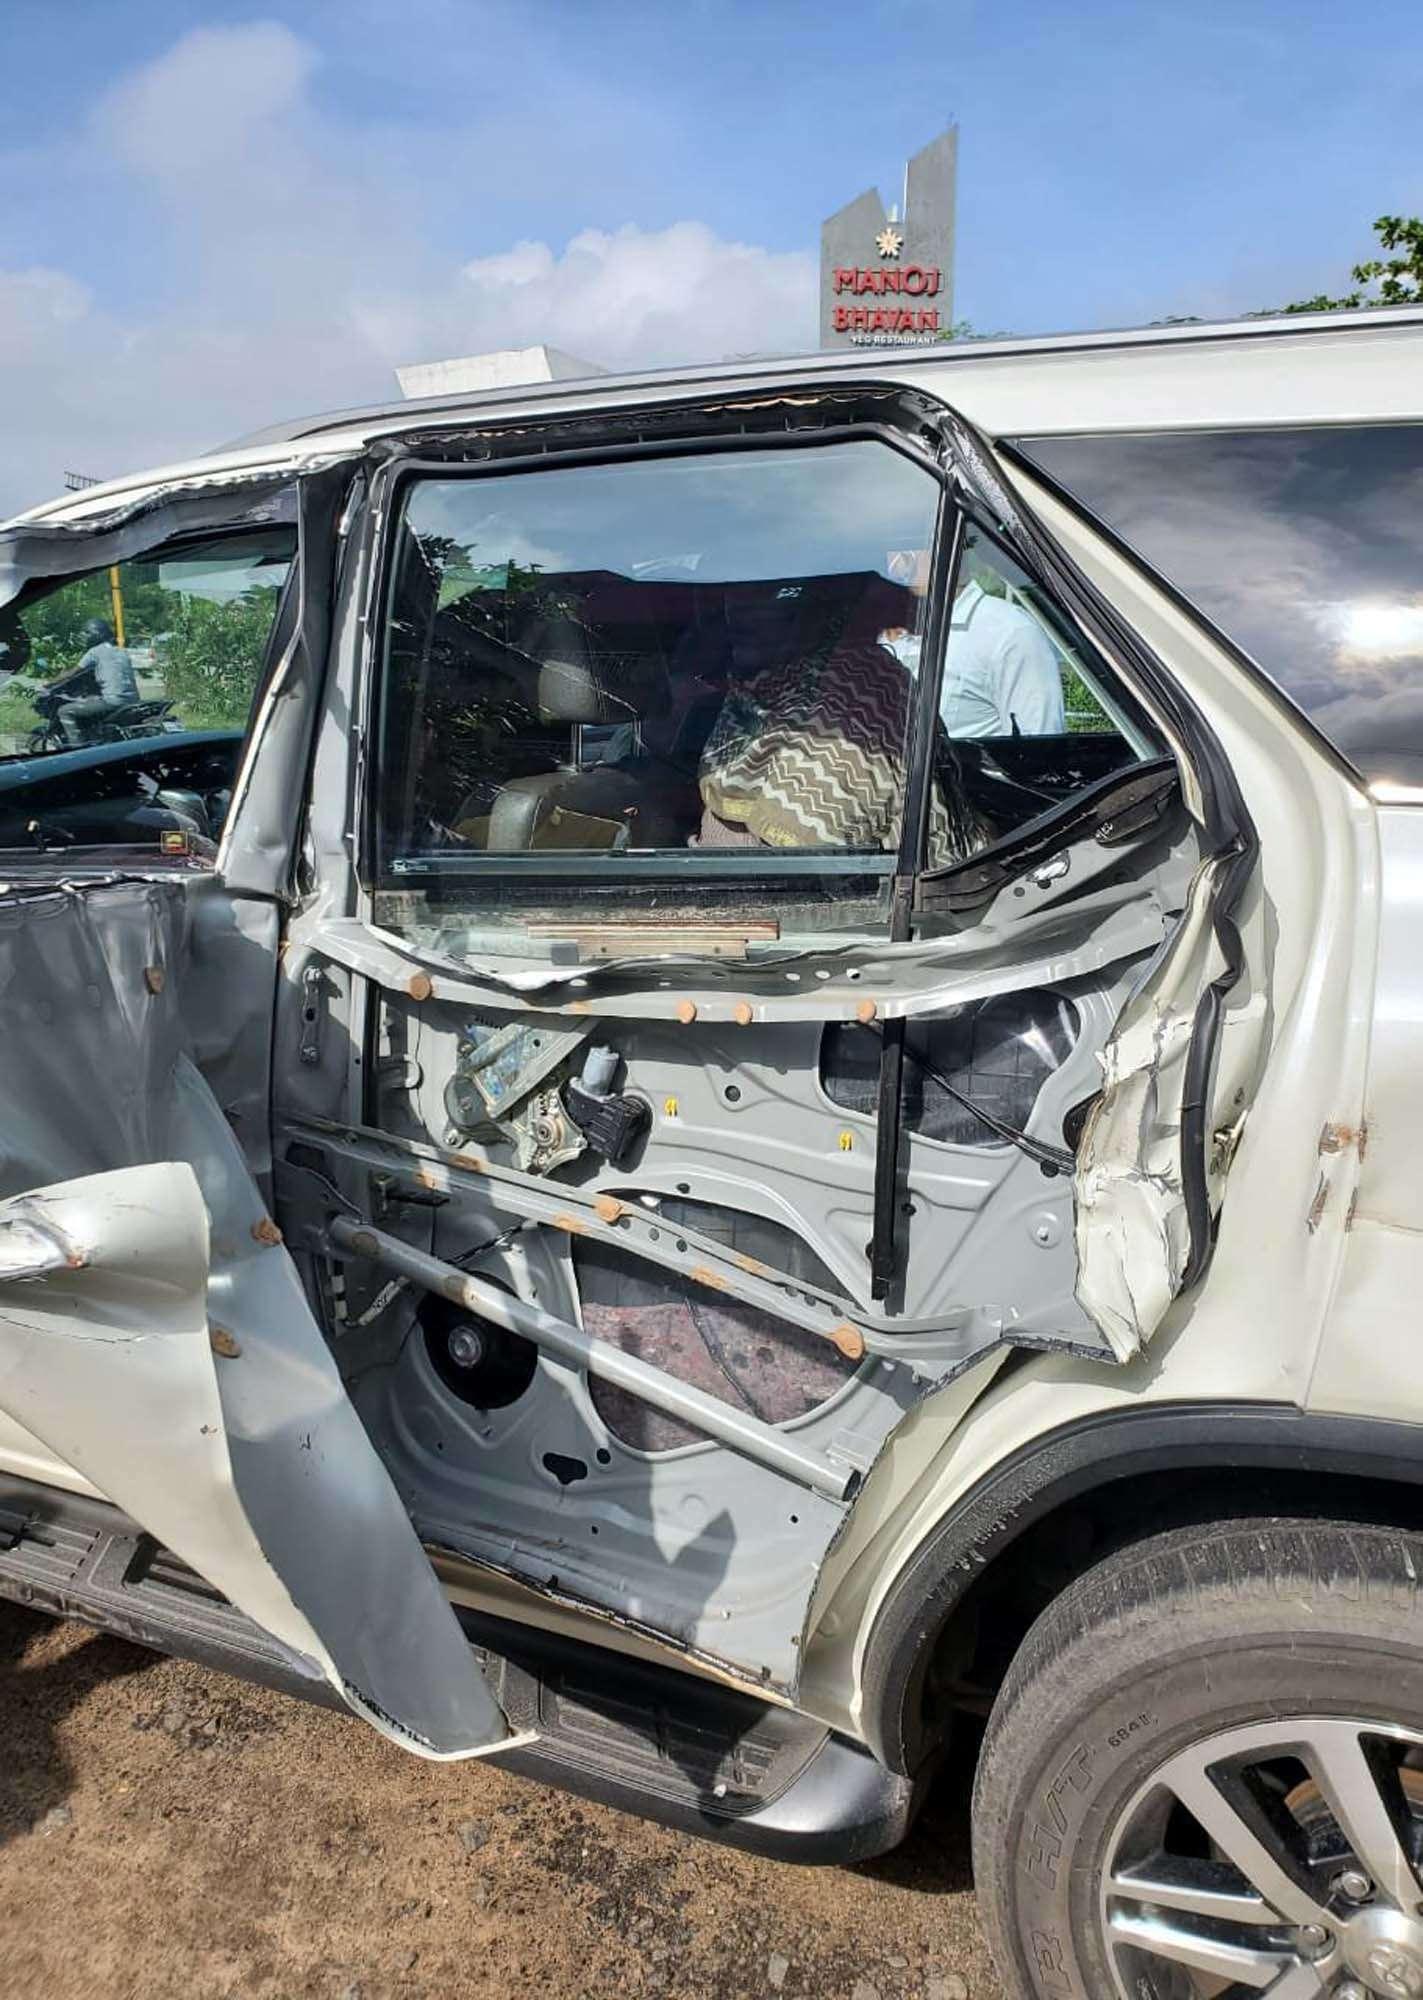 Actor turned politician Khushbu Sundar shares her shocking car accident pictures on social media